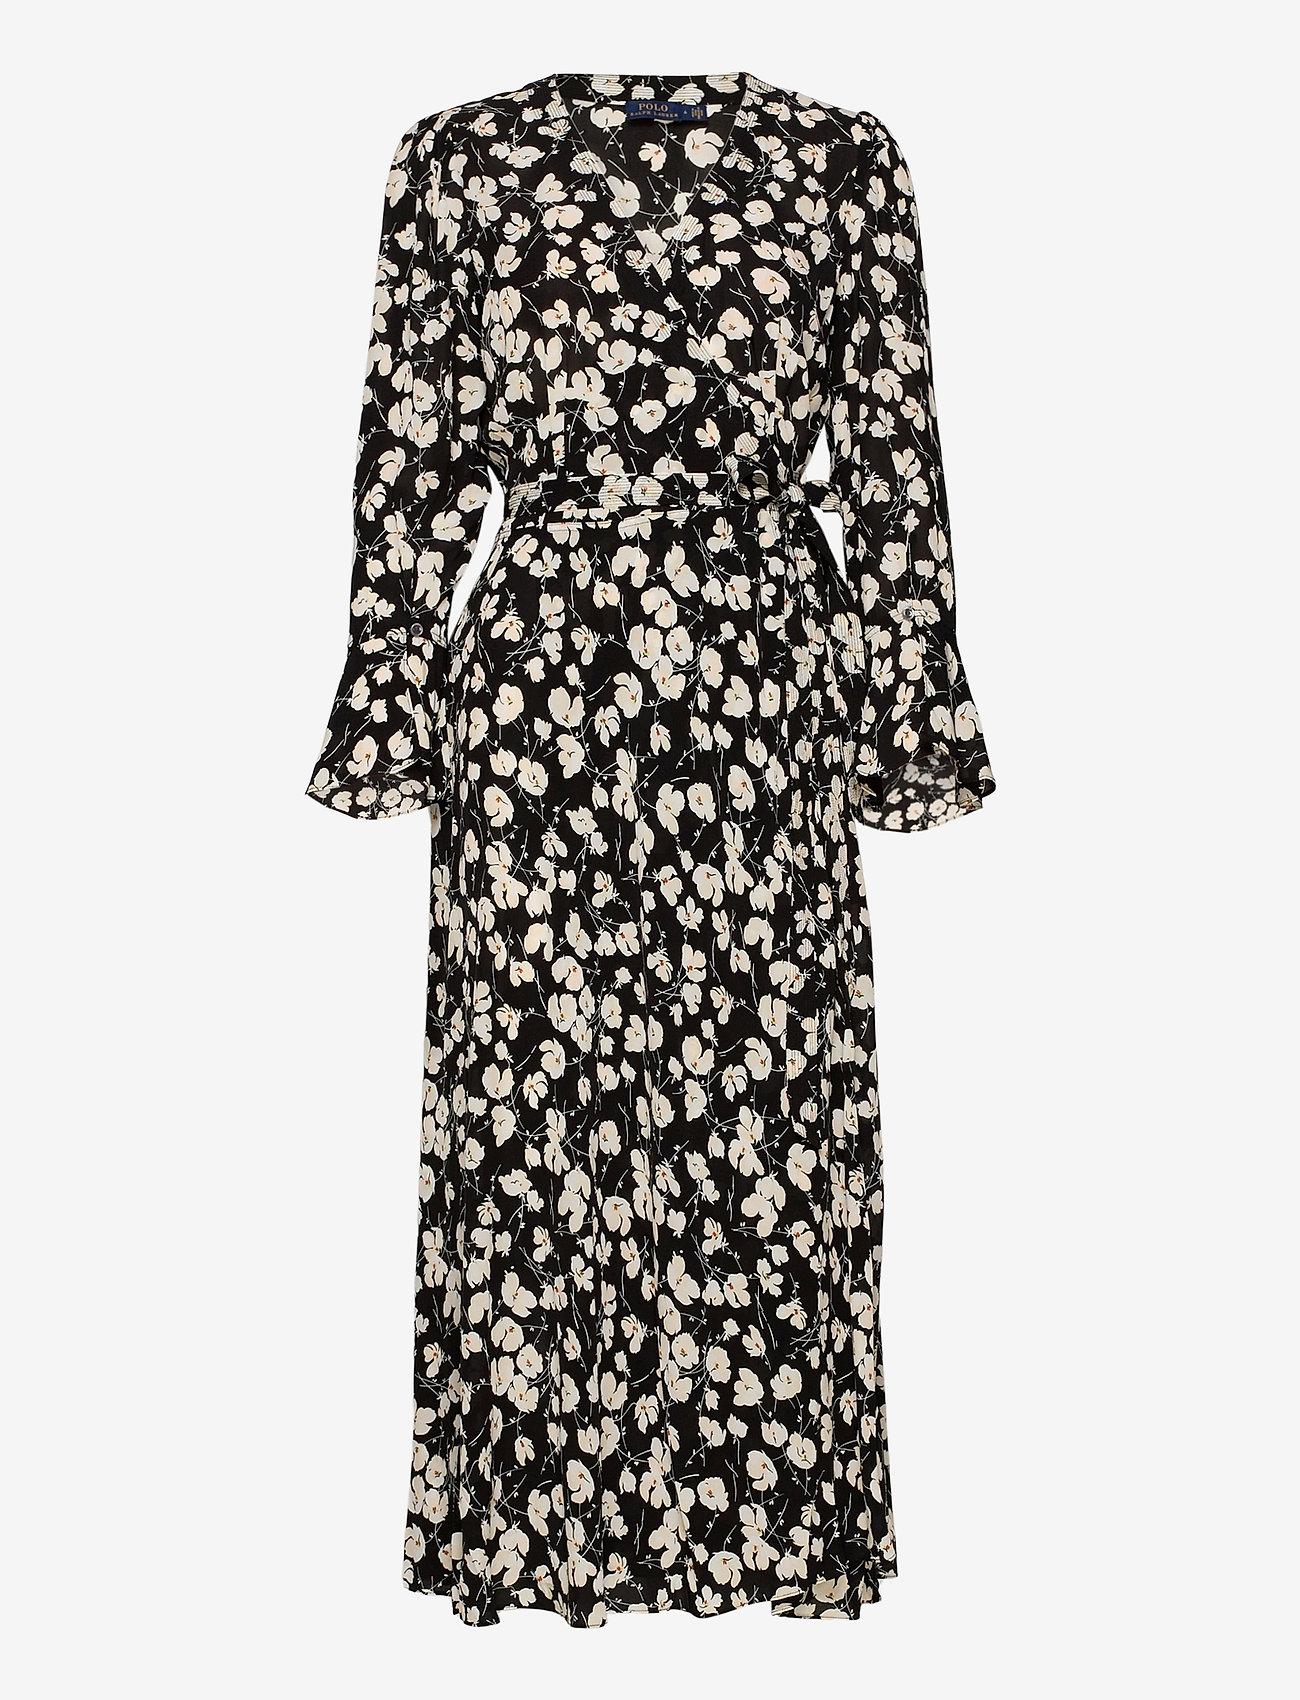 Polo Ralph Lauren - Floral Wrap Dress - everyday dresses - 766 black/white i - 1